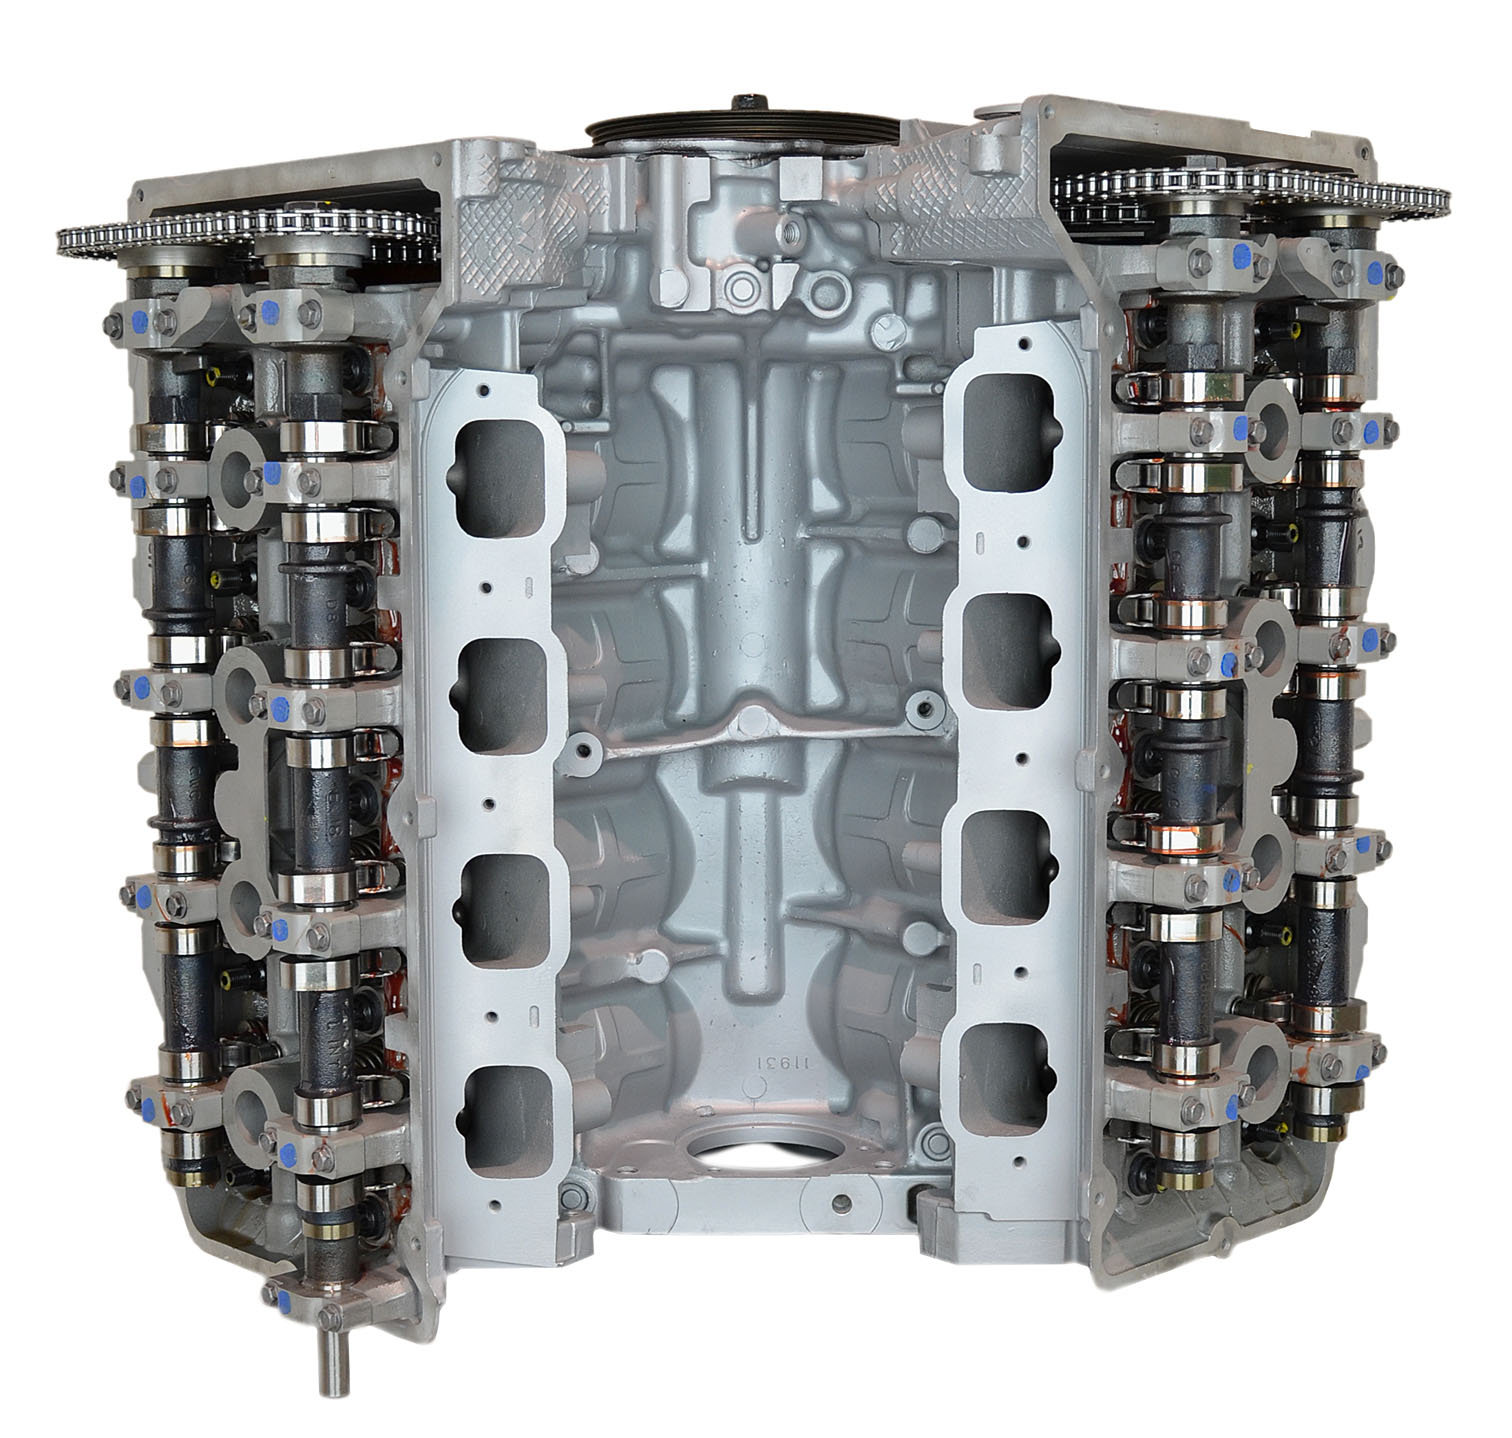 03-05 Cadillac Deville 4.6 NorthStar Engine VIN 9